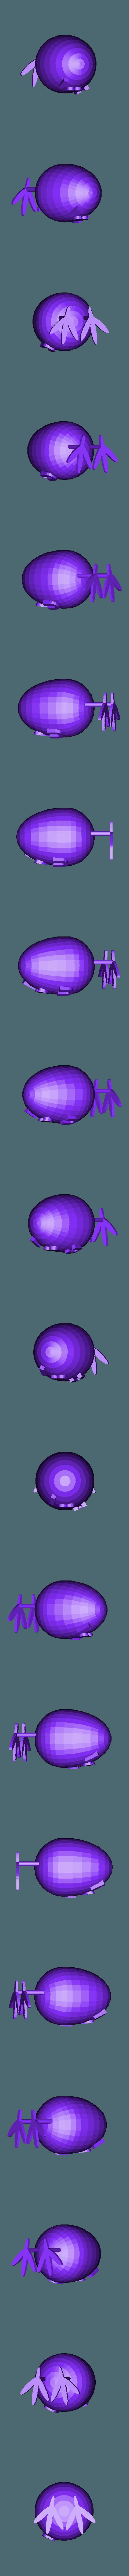 egg.stl Download free STL file egg love • 3D printing object, brayanrosas94